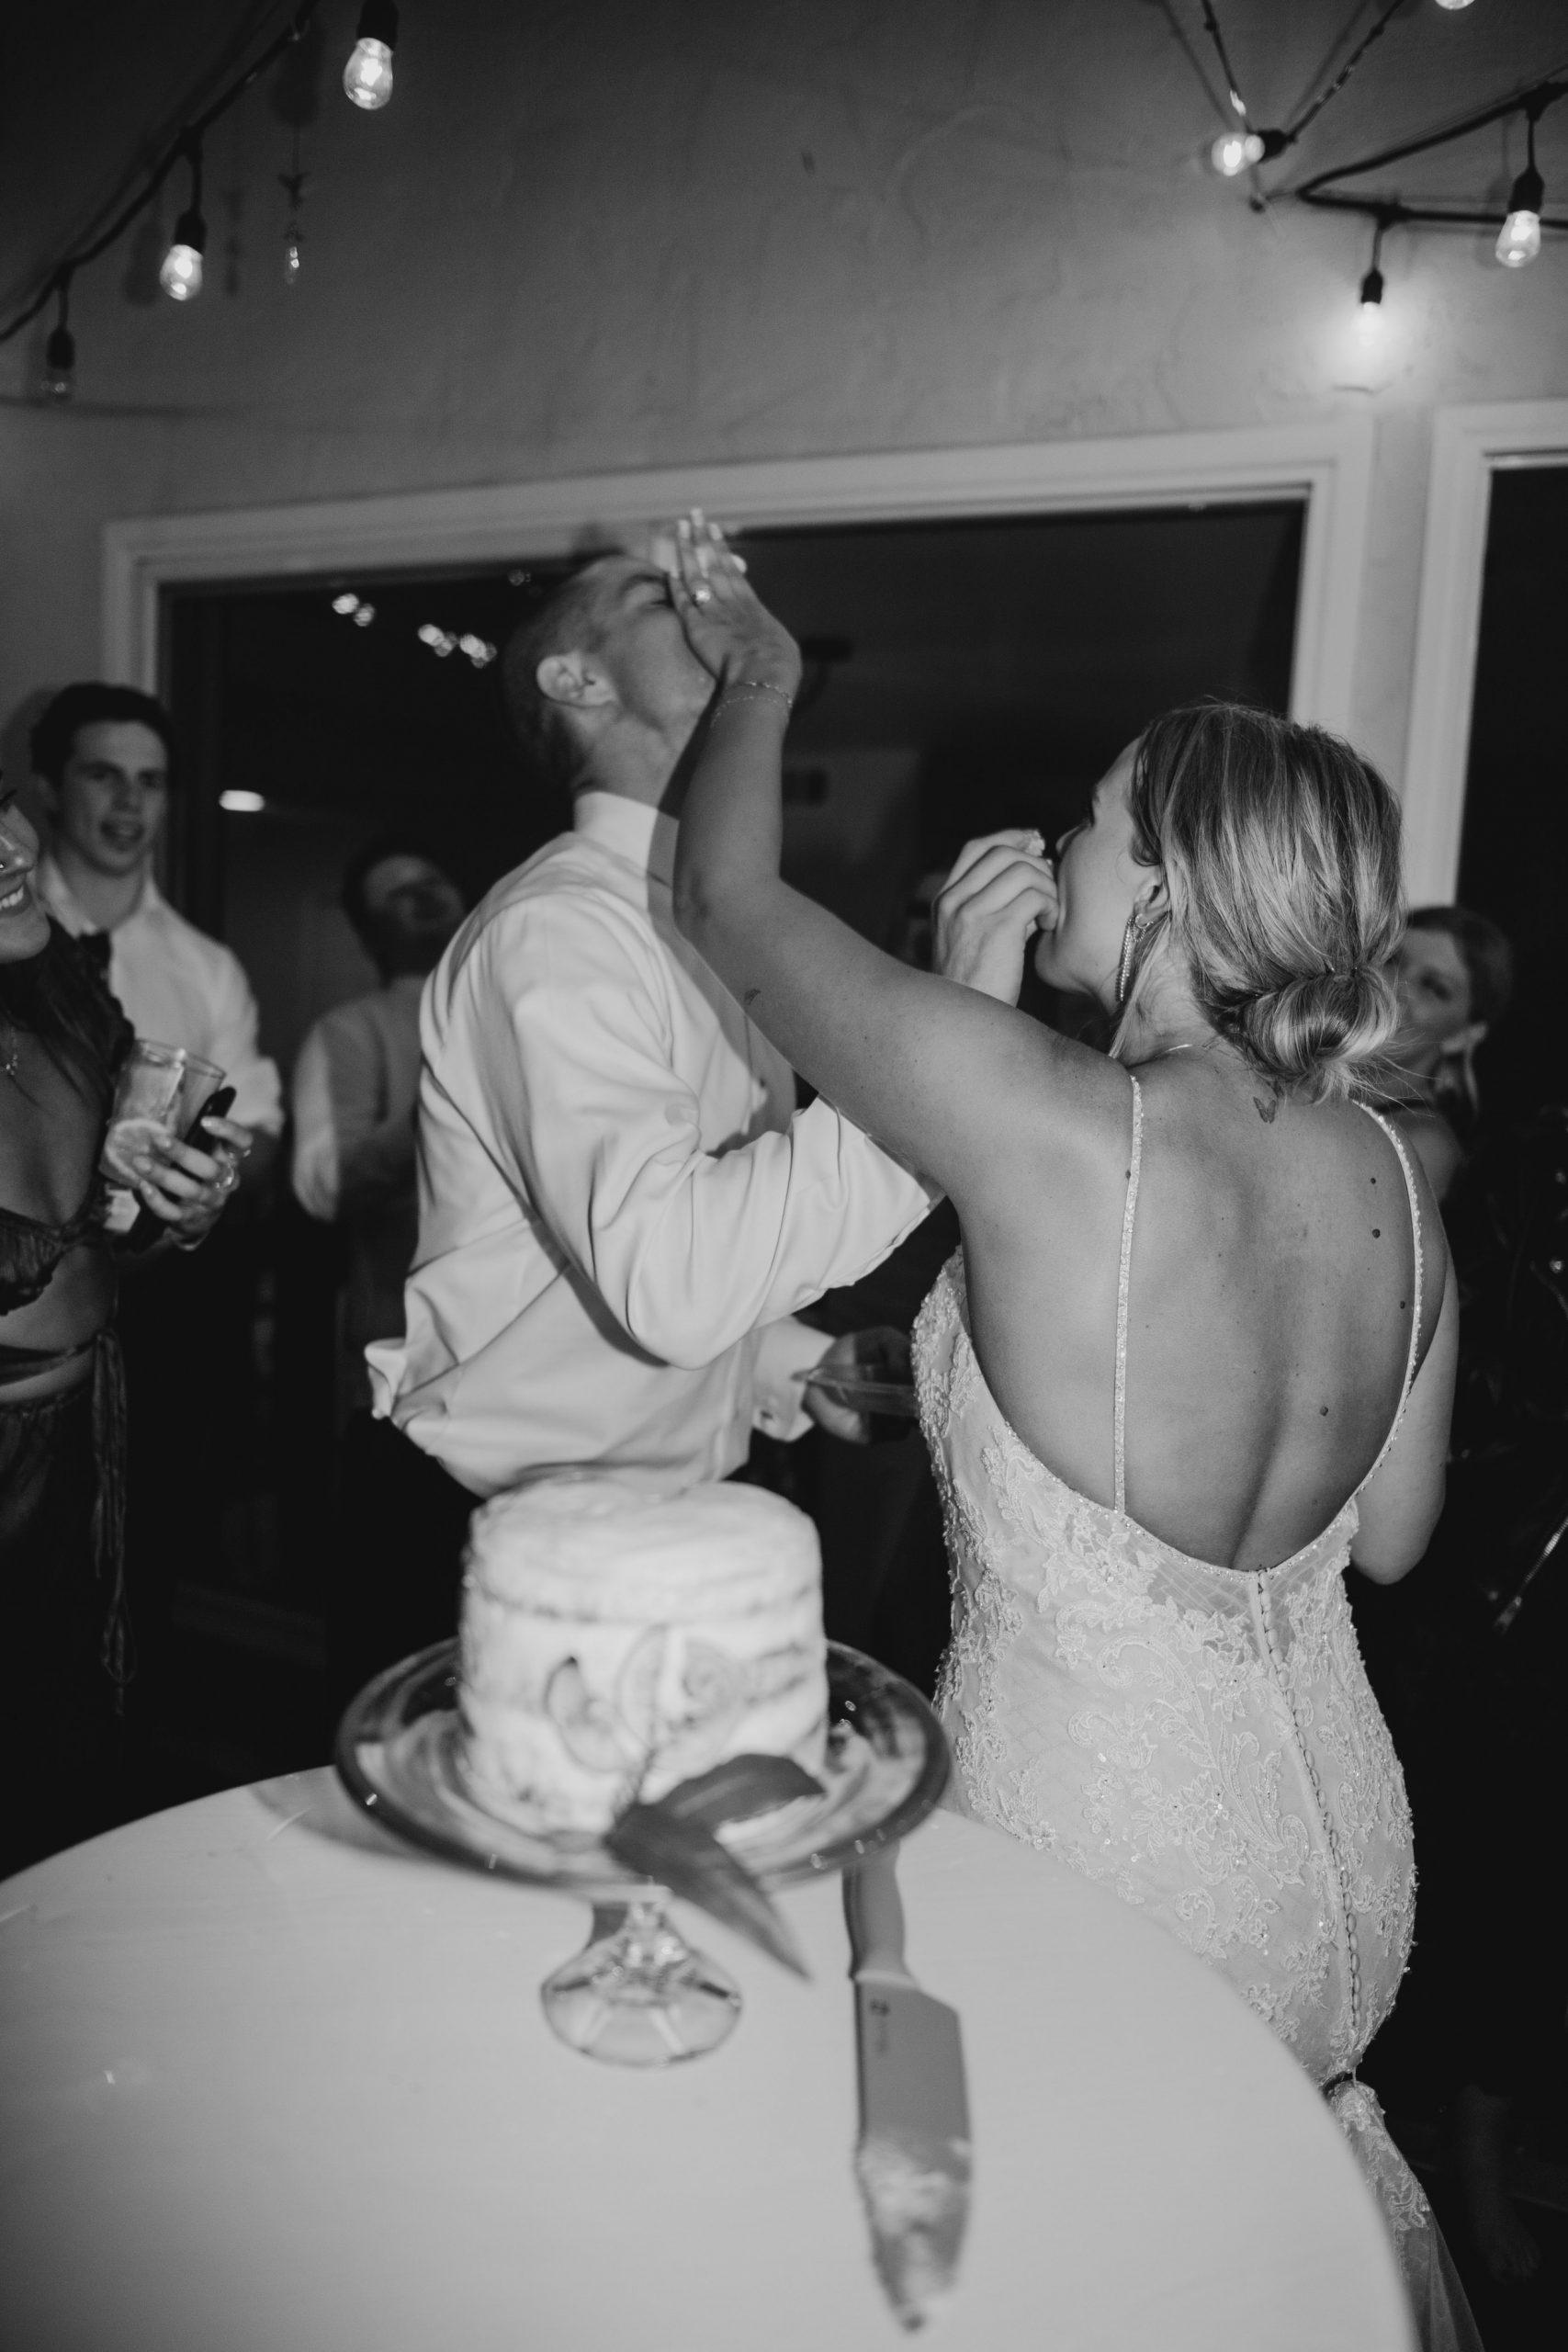 Bride and groom cut cake in Bouquet toss in Laguna Beach Backyard Wedding, image by Fatima Elreda Photo